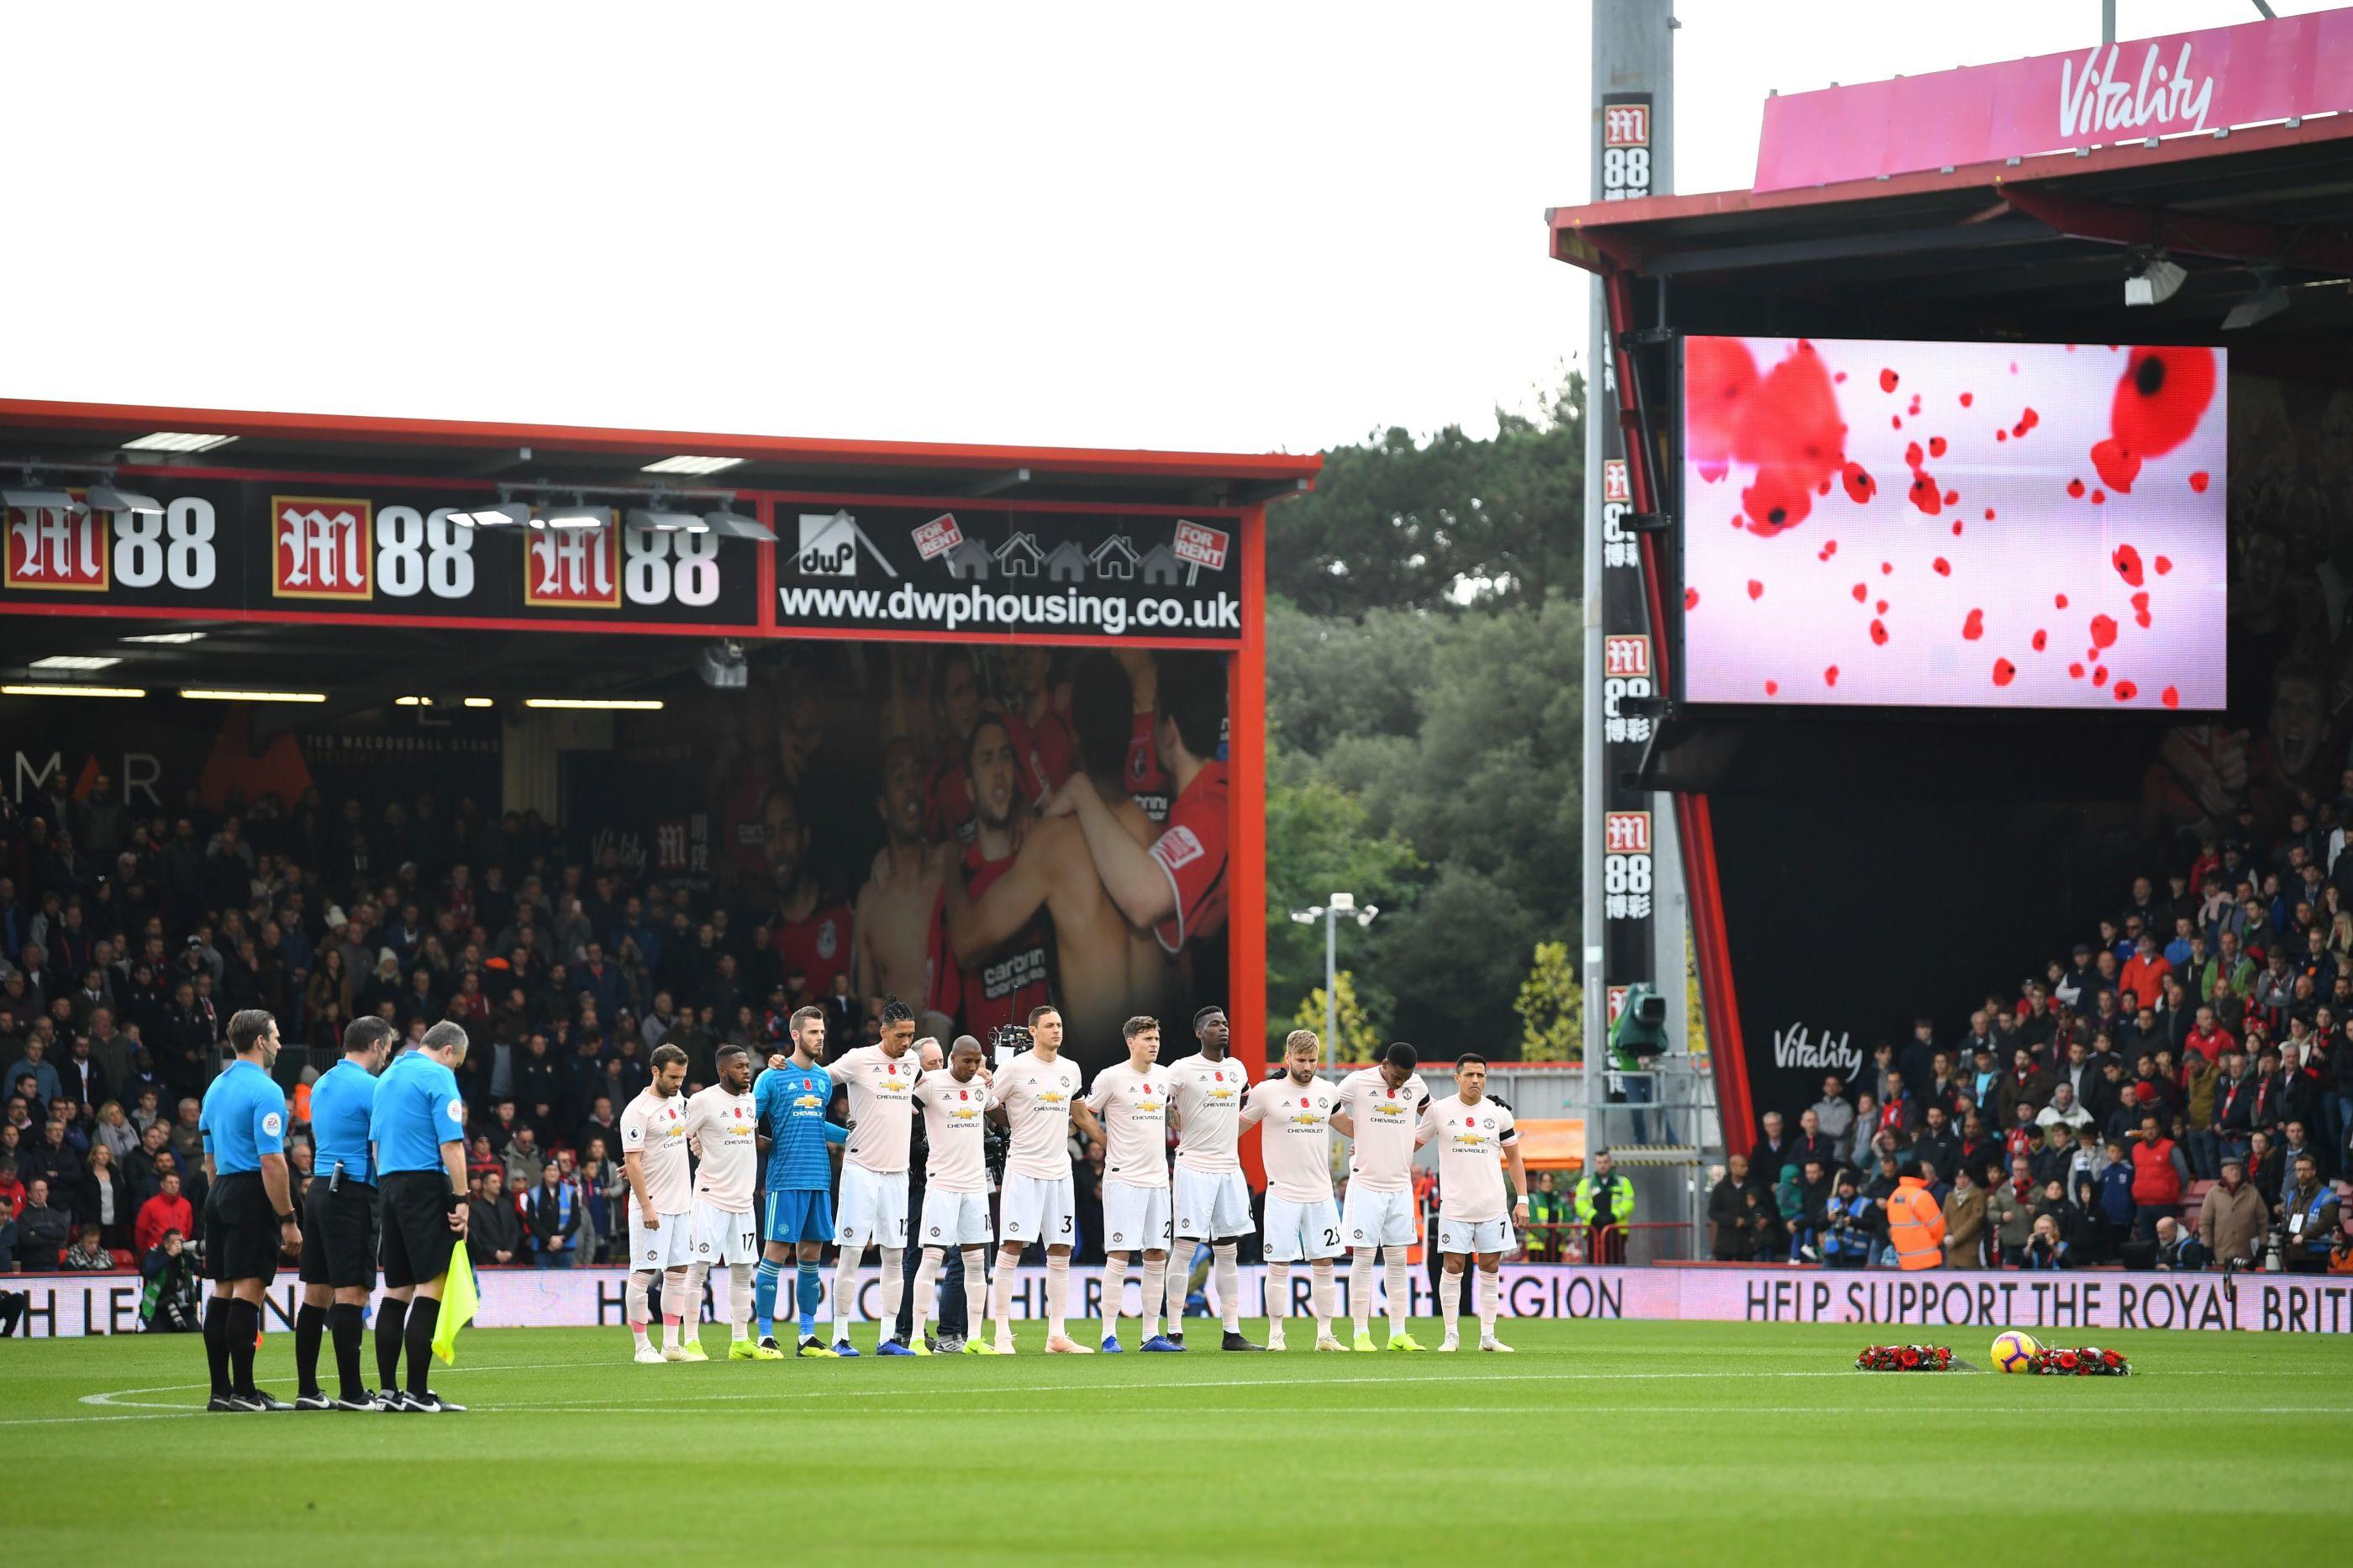 Os nove minutos de silêncio que arrepiaram a Premier League